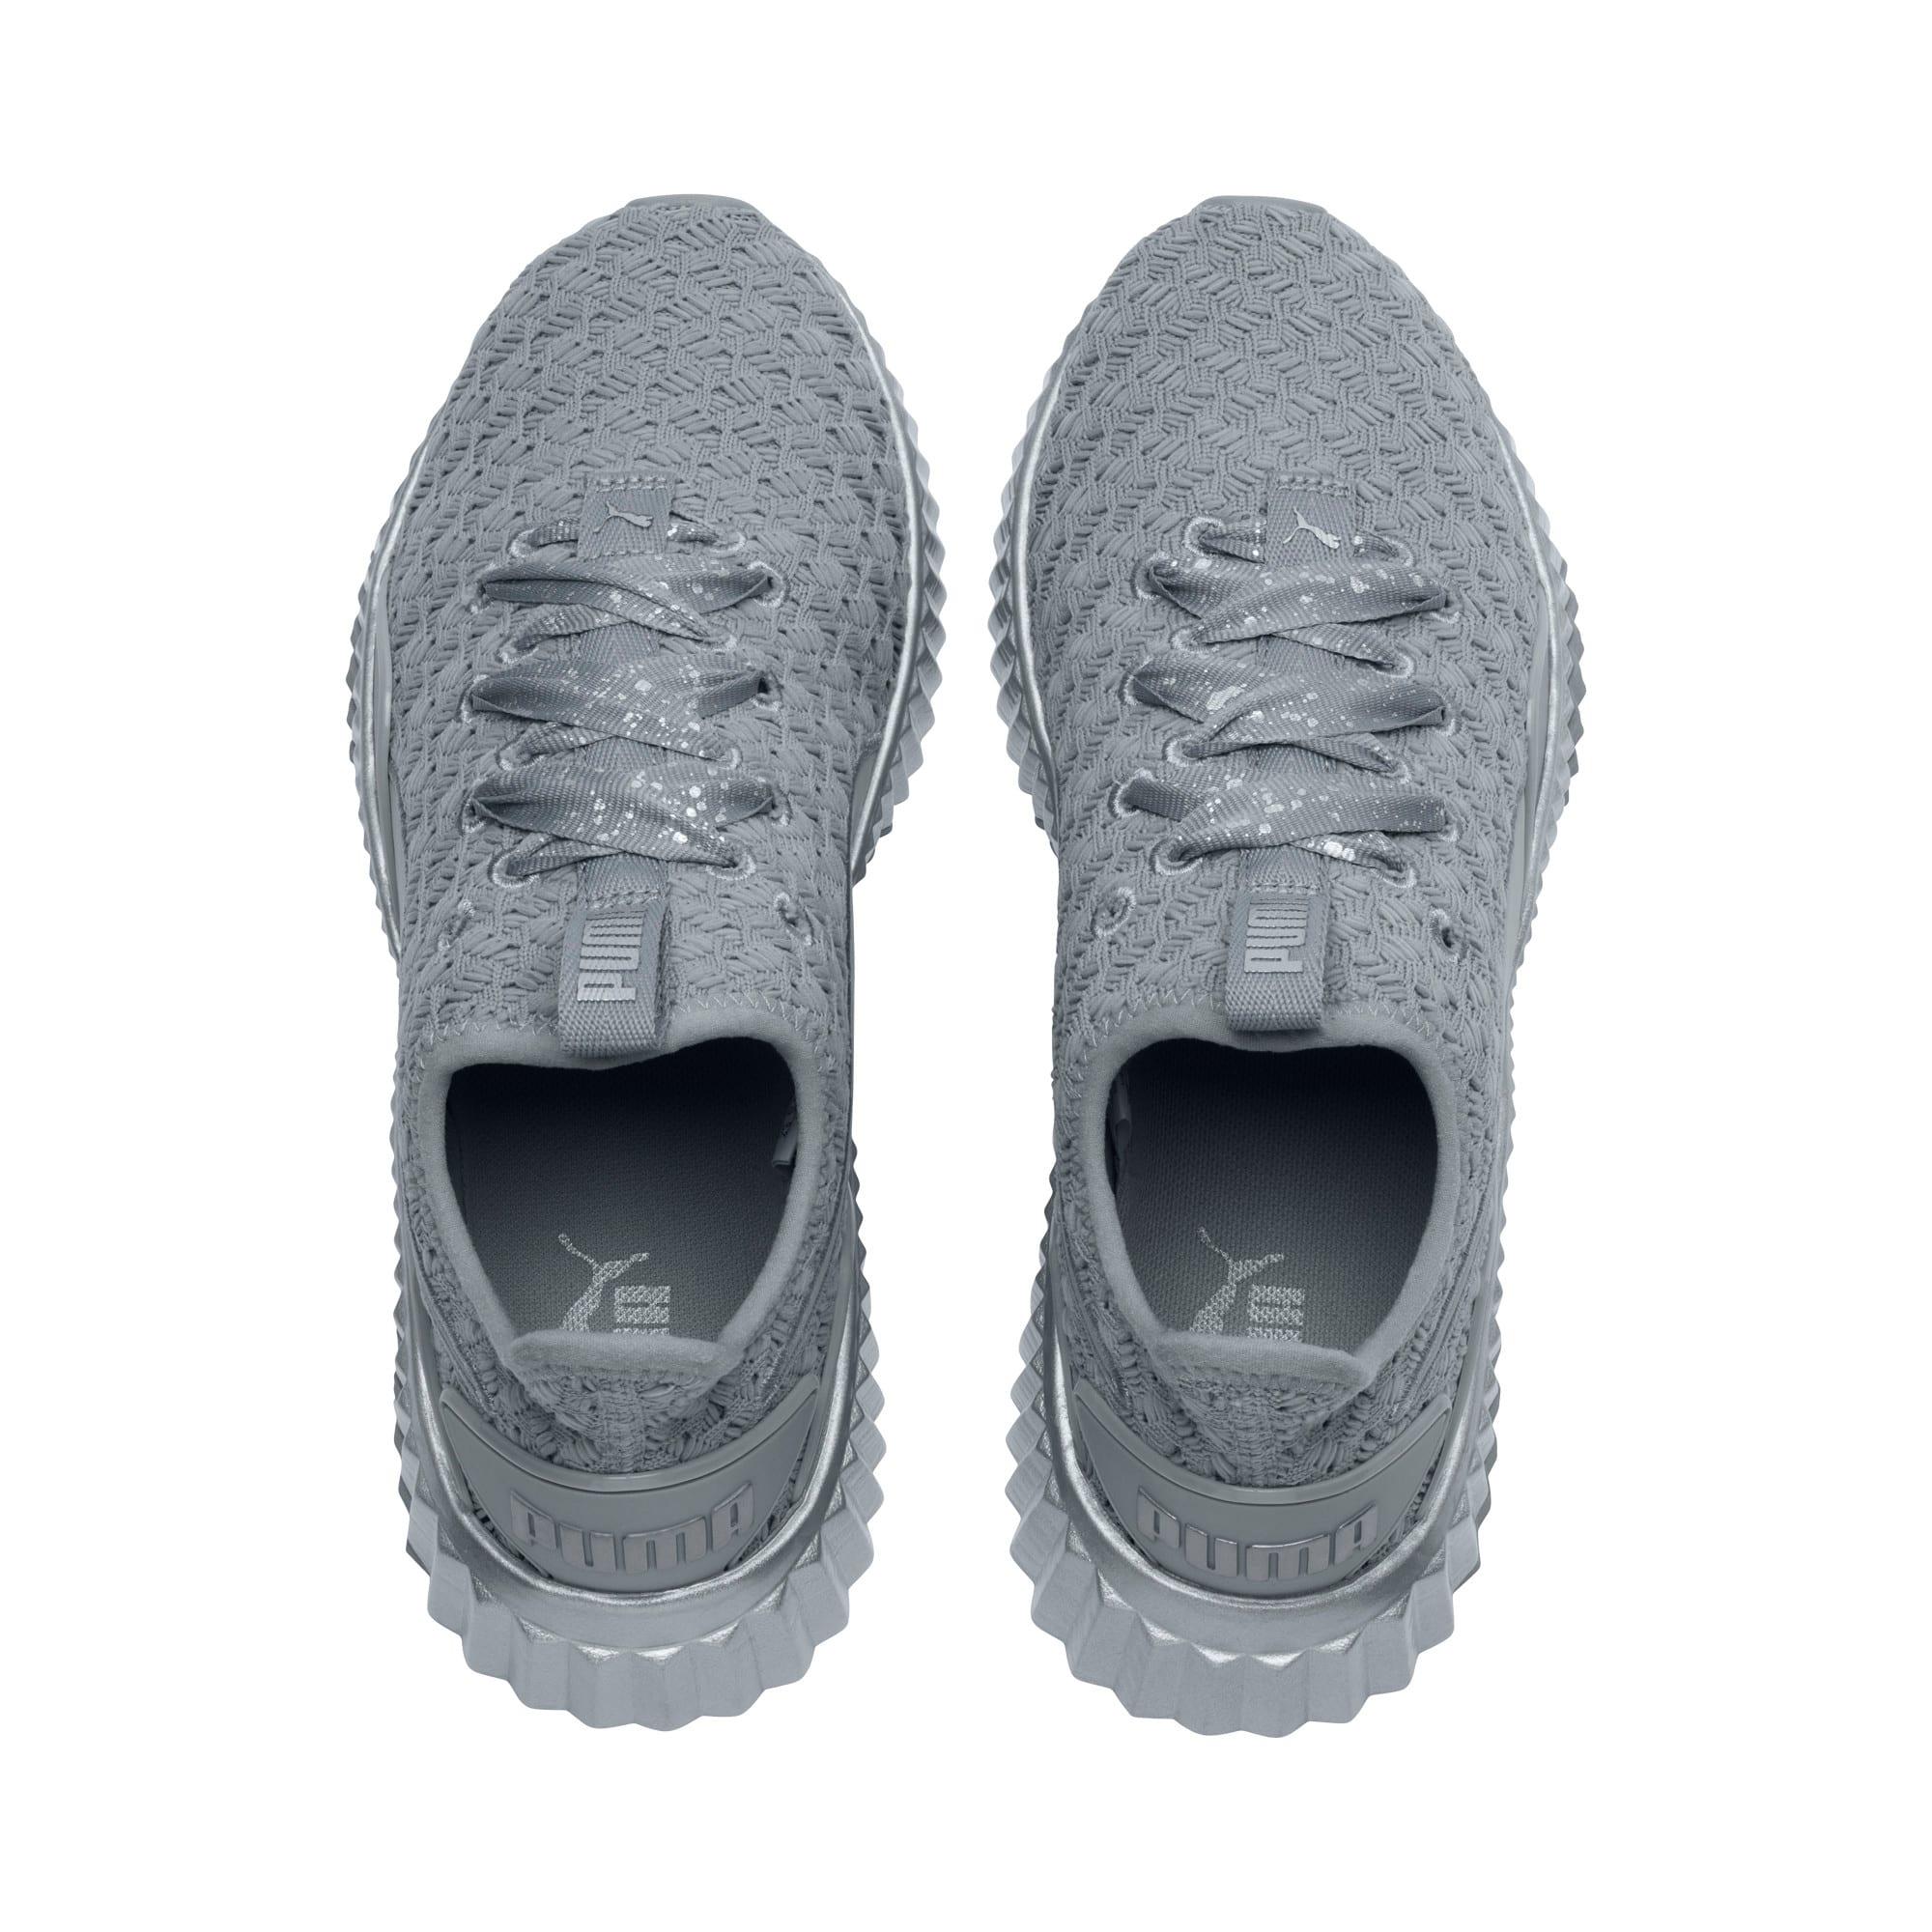 Thumbnail 6 of Defy Sparkle Women's Training Shoes, Quarry-Puma Silver, medium